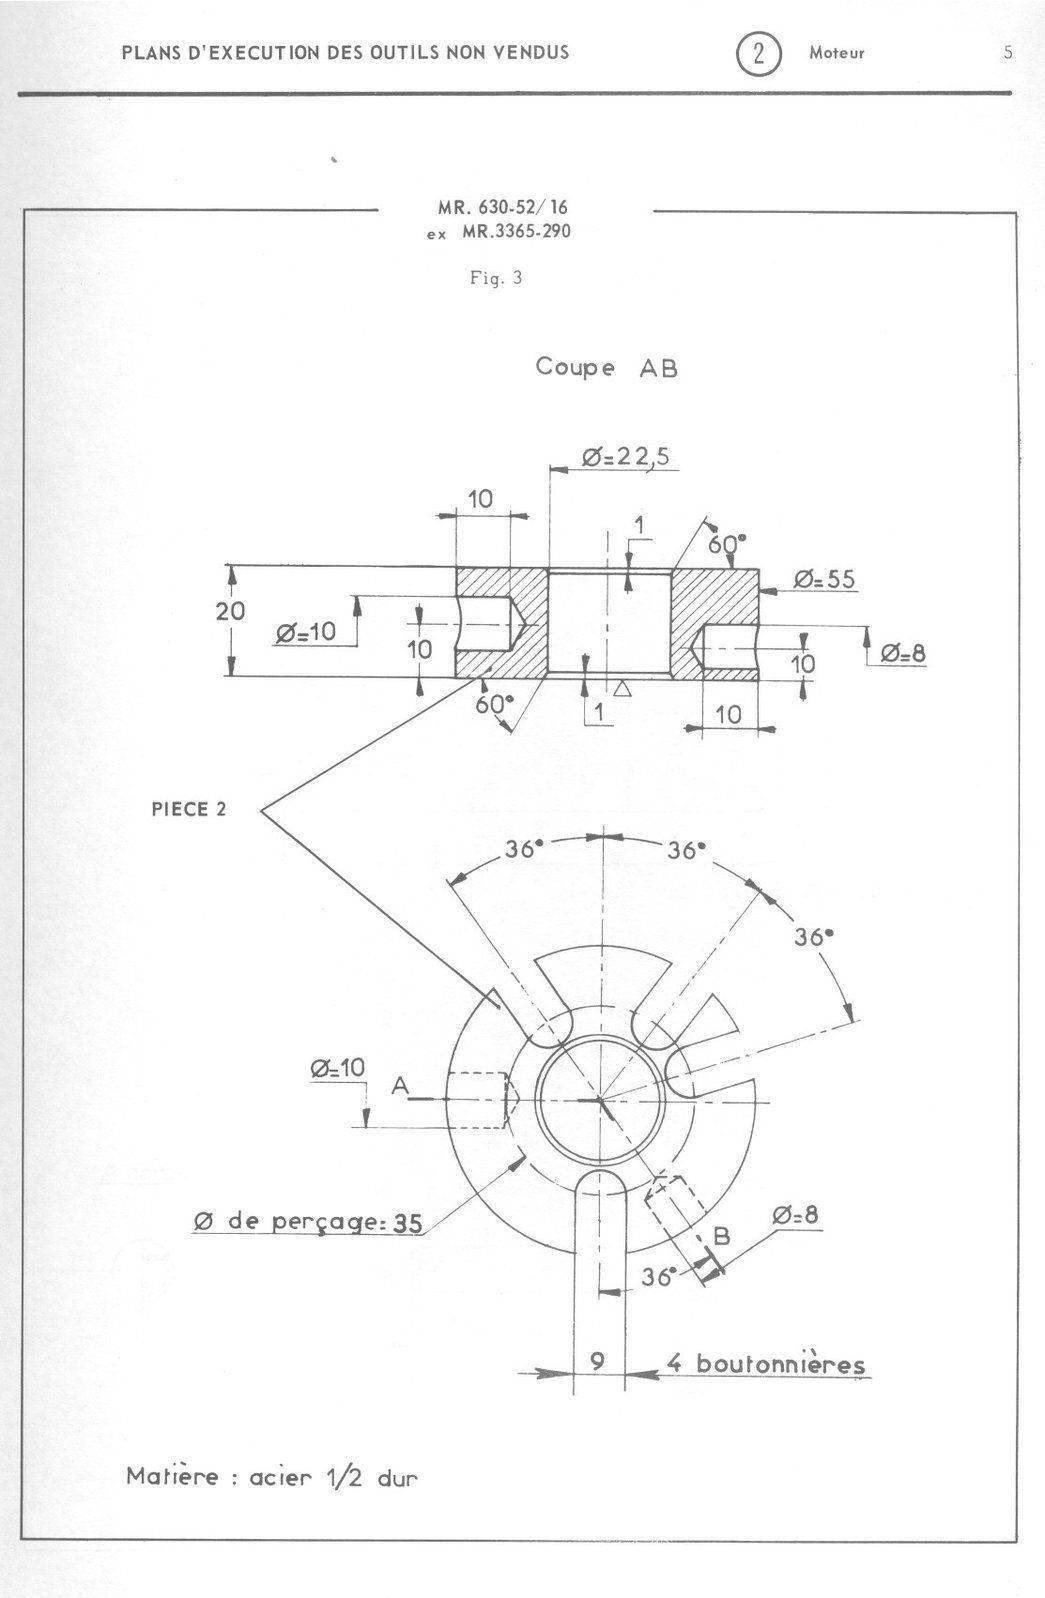 MR-630-52-16-3.jpg